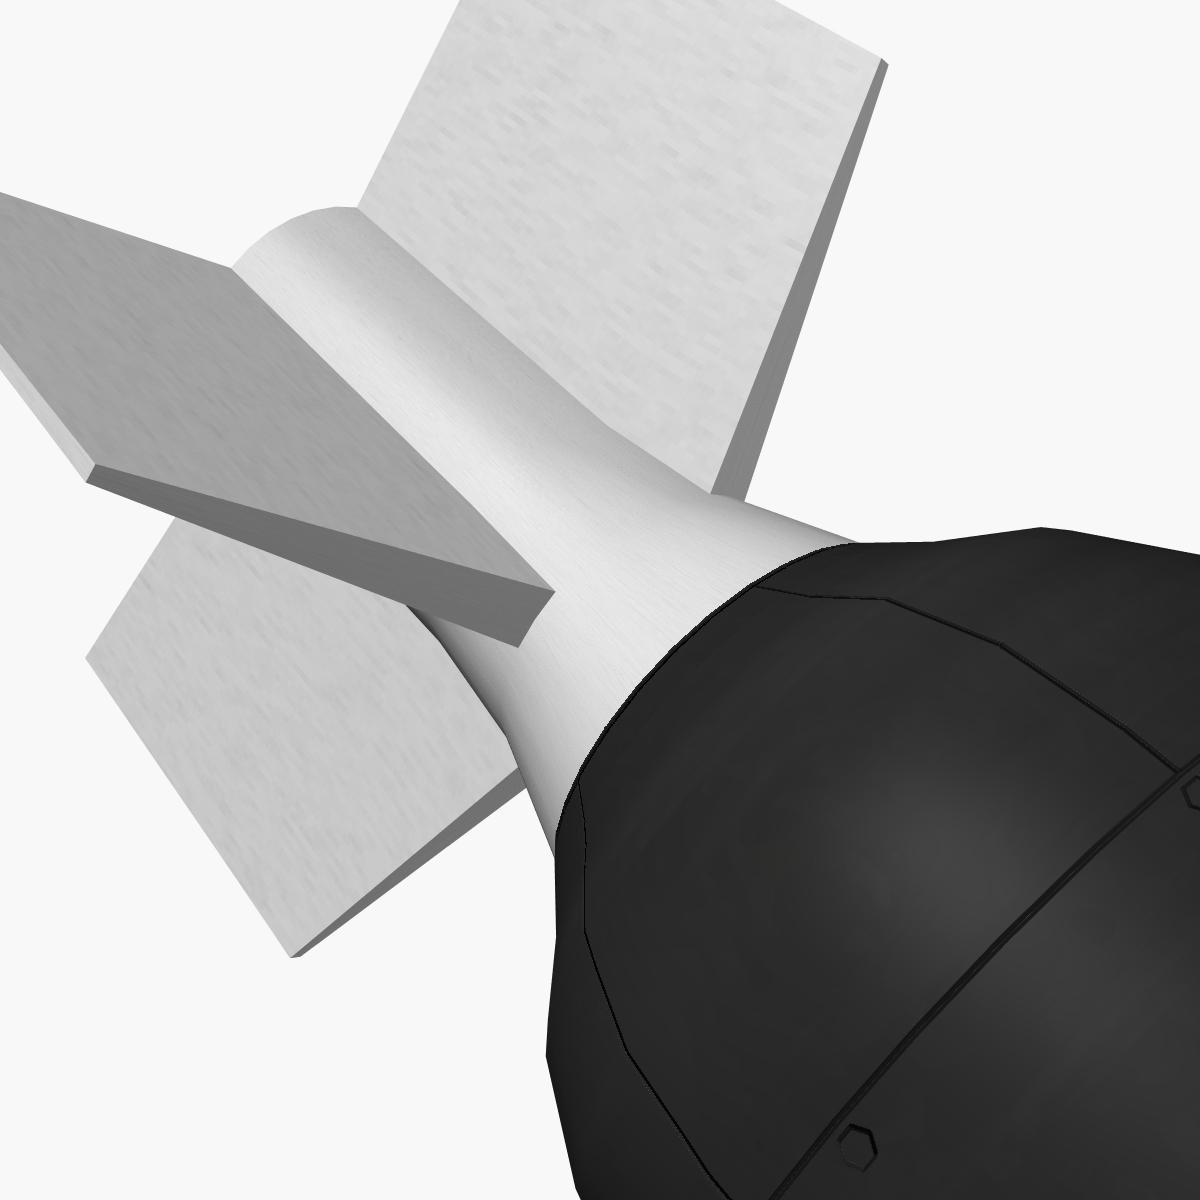 Bomb, Jolly Roger scheme 3d model 3ds dxf fbx blend cob dae X obj 162669